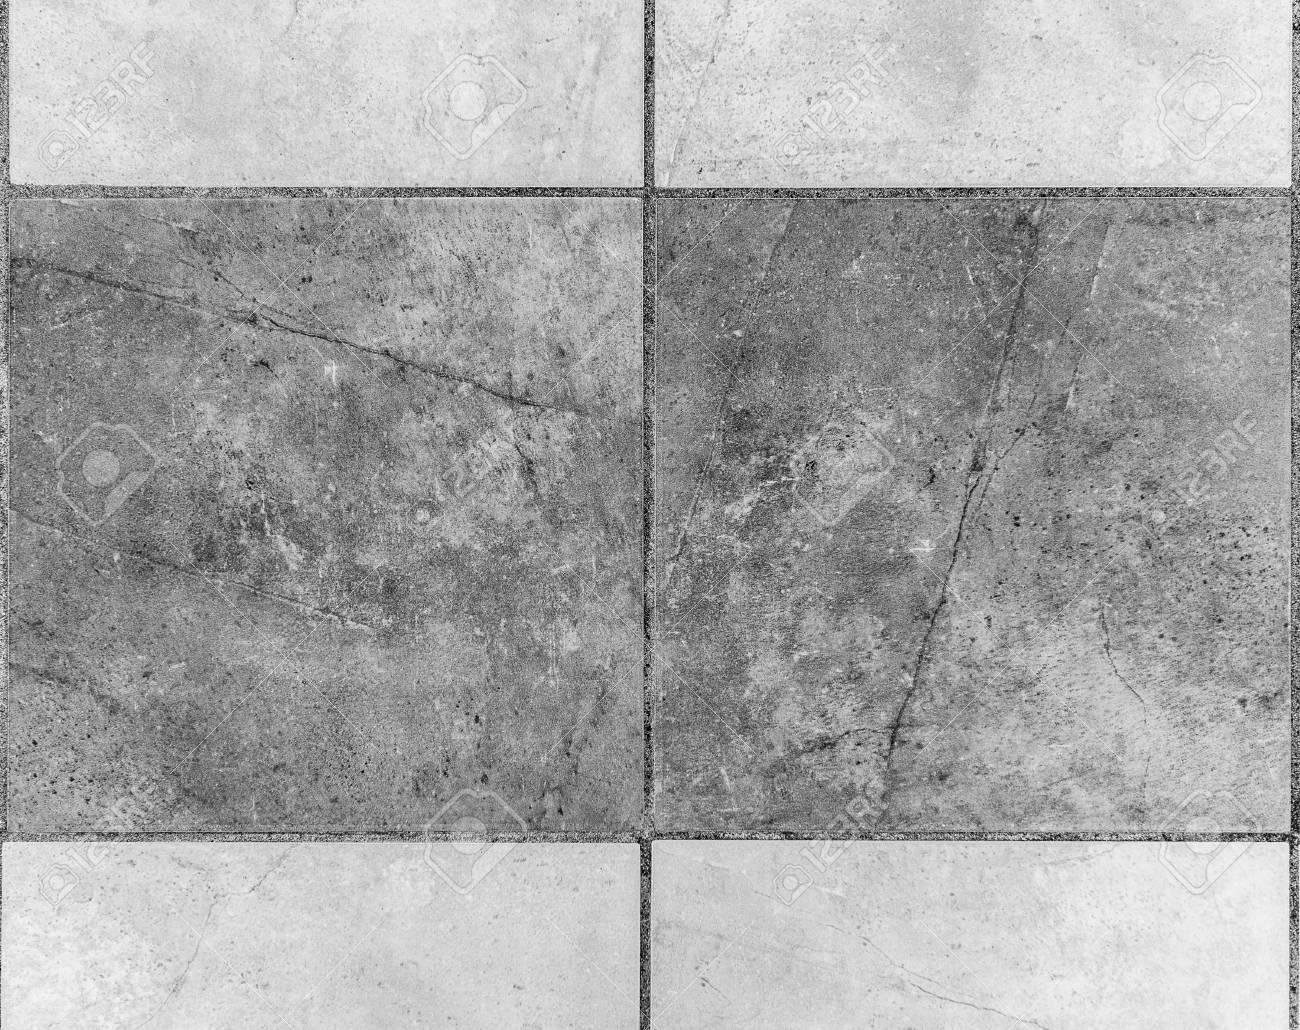 Terraza Exterior Baldosas De Ceramica Imagen De Pisos Exteriores - Losas-de-exterior